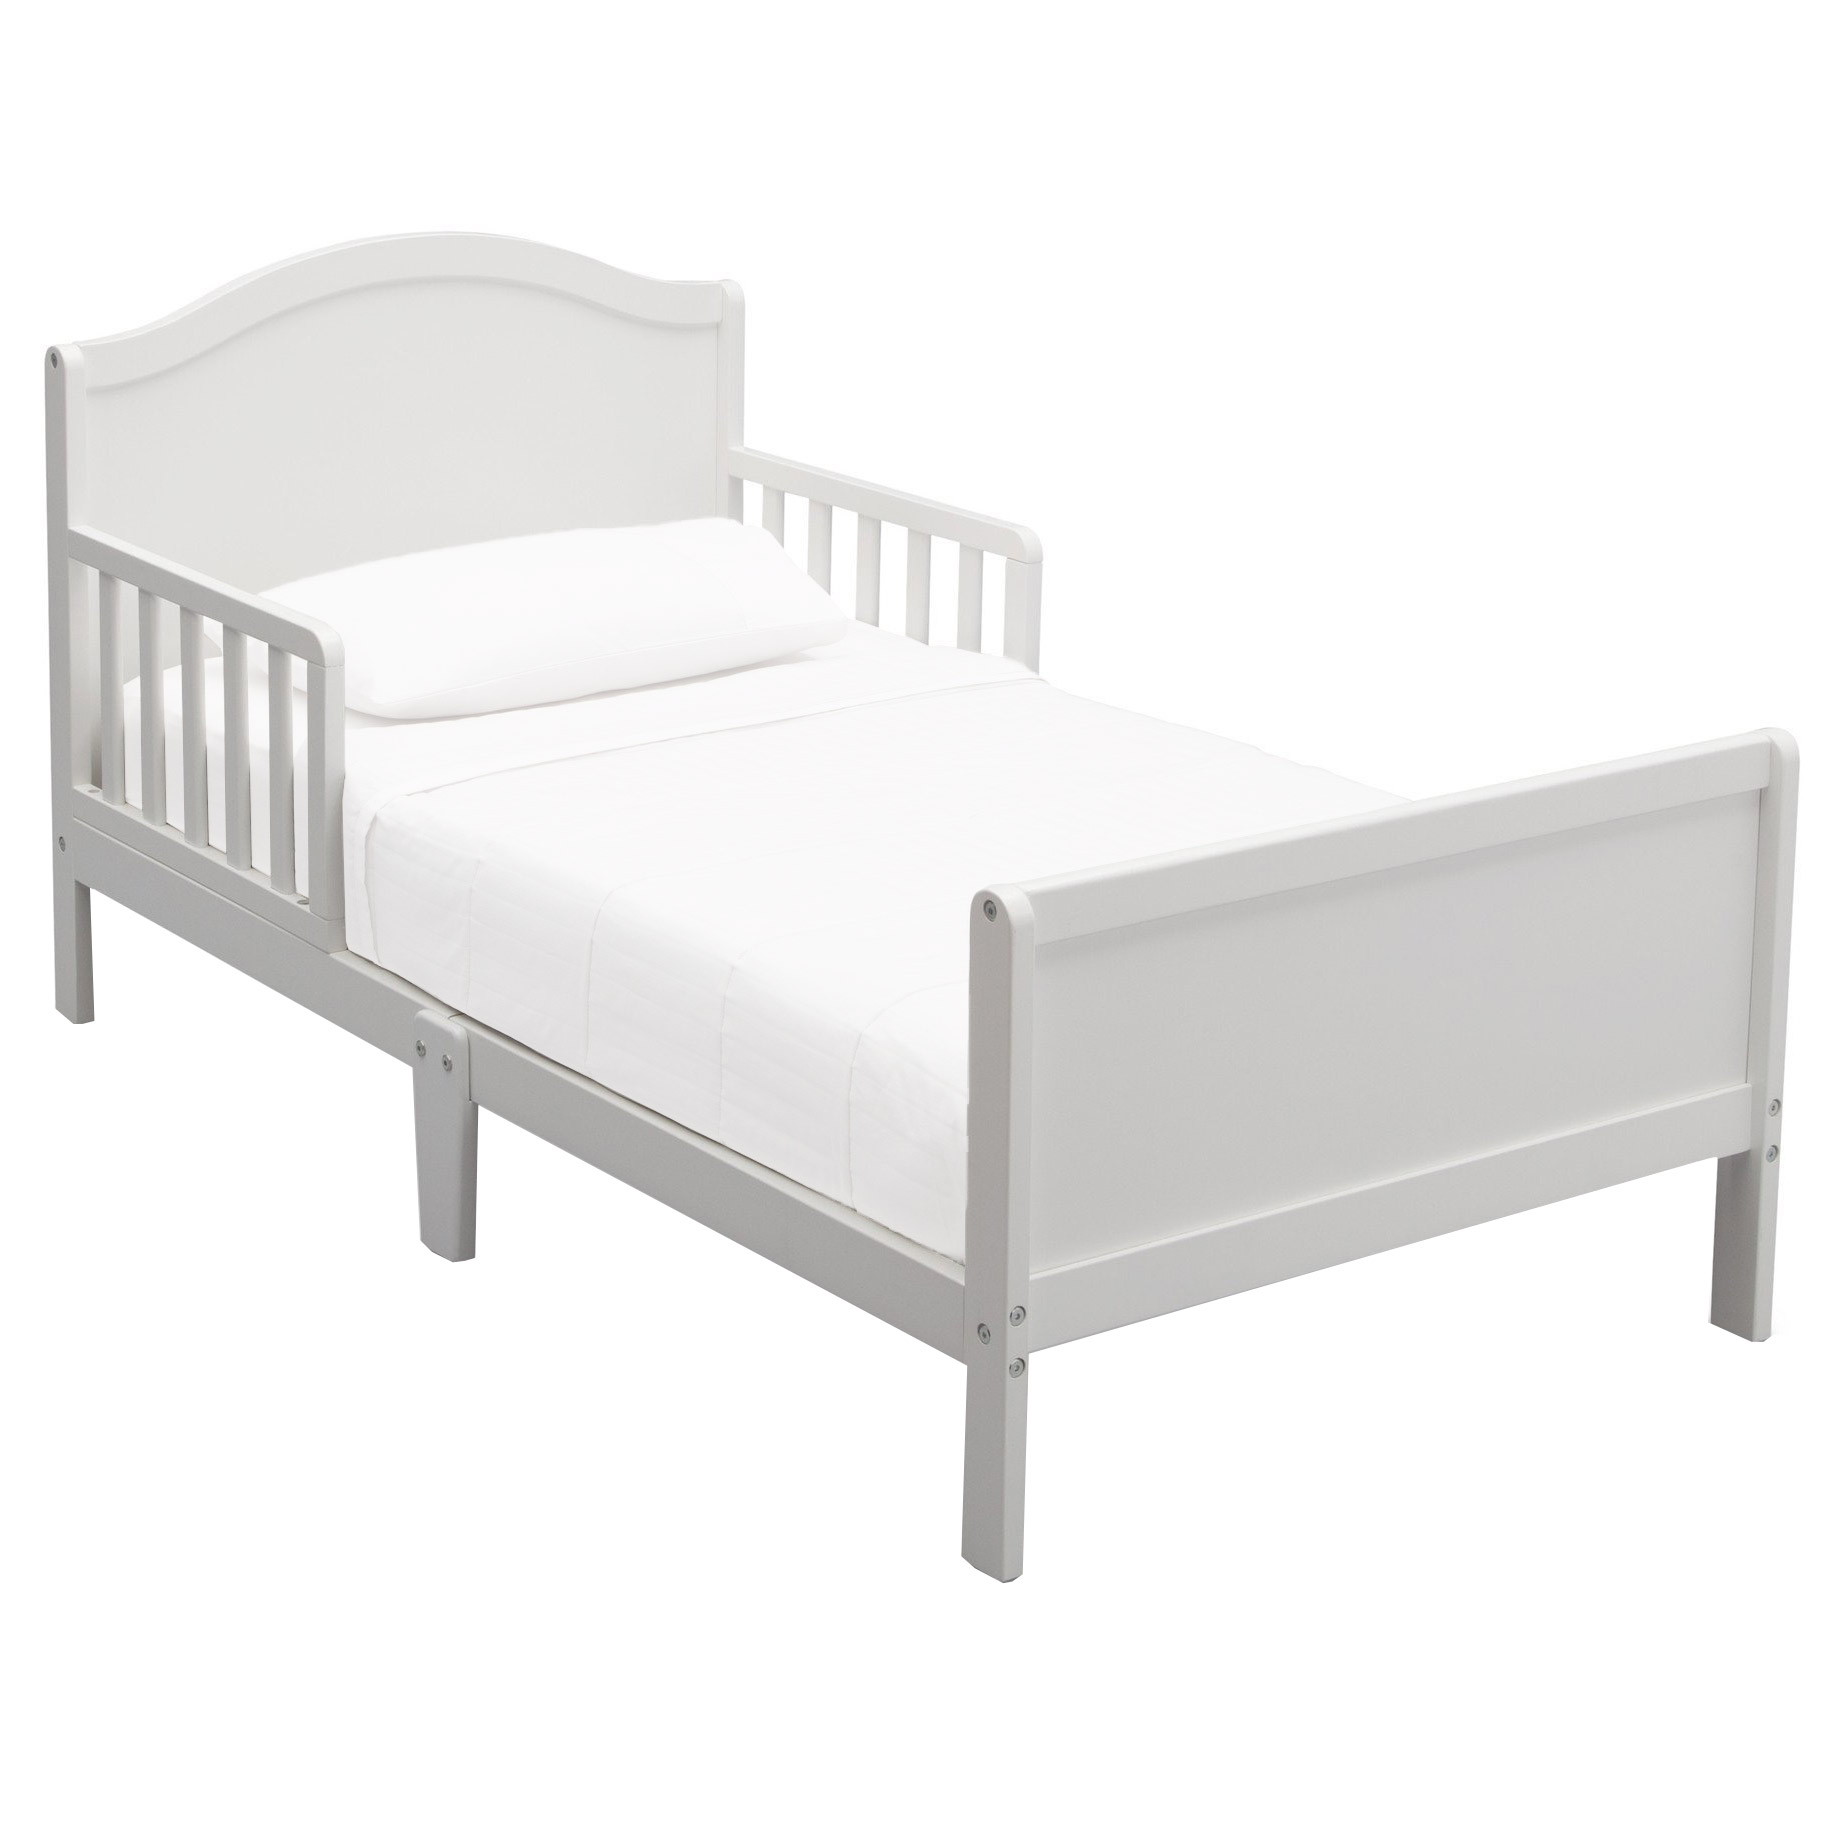 Delta Children Bennett Toddler Bed Frame with Guardrails, White (Bed ...